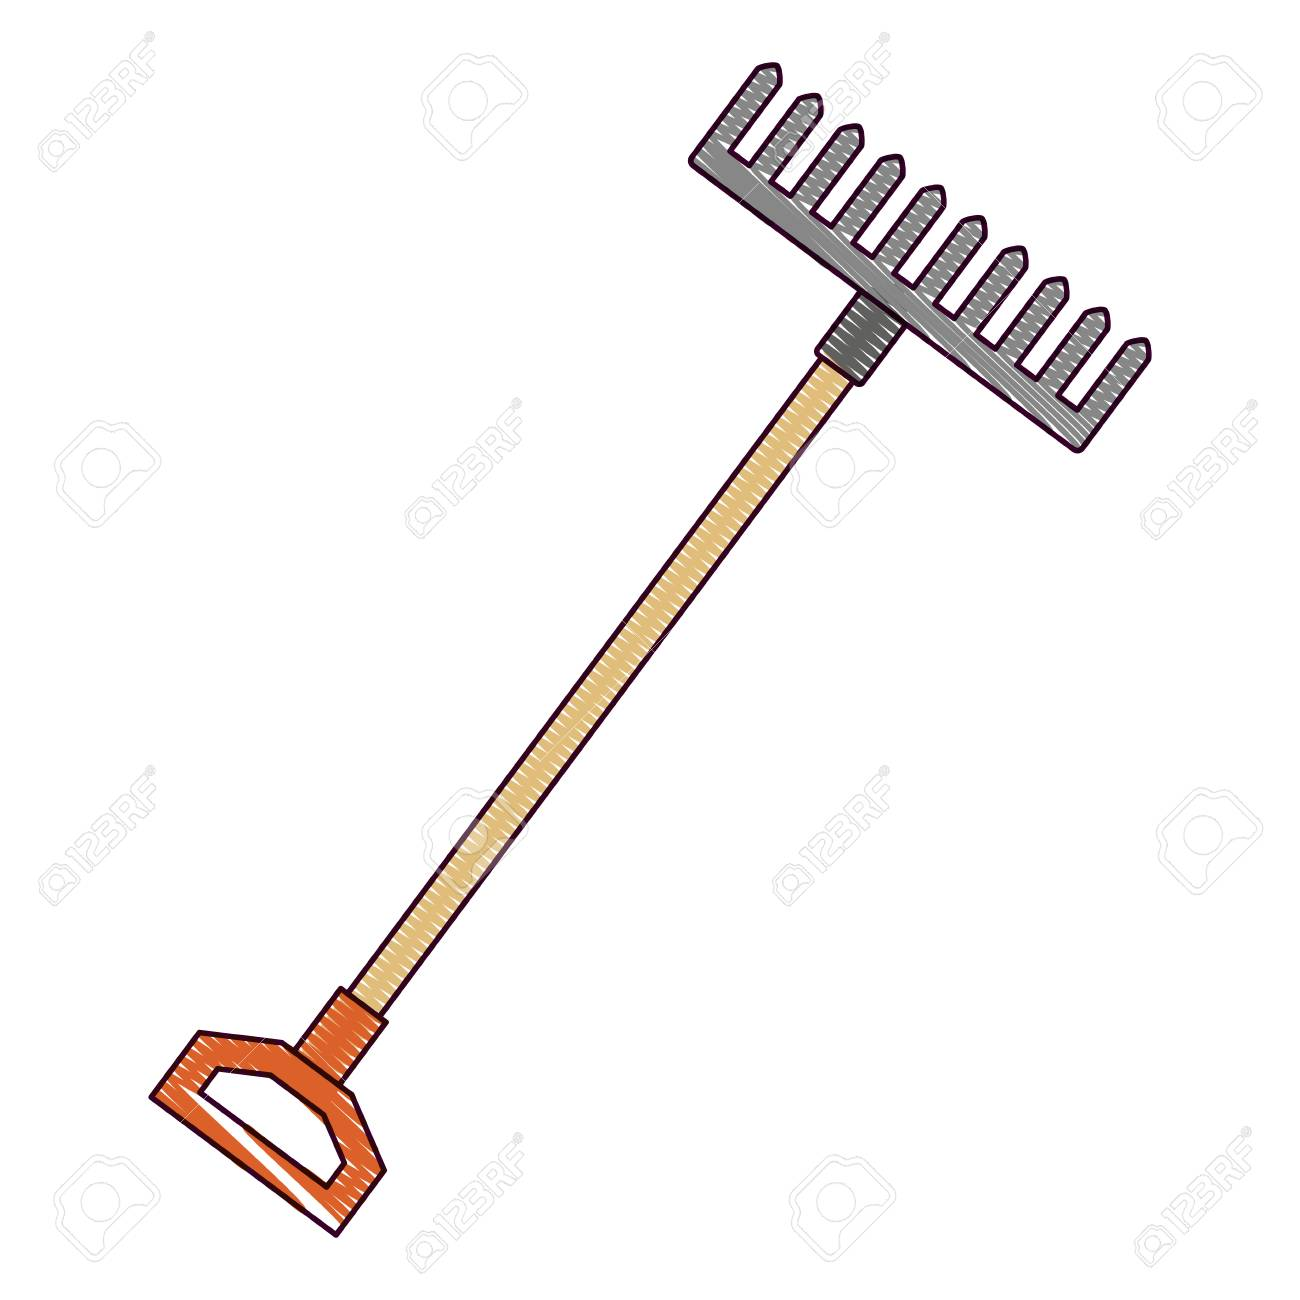 gardening rake isolated icon vector illustration design - 91871100